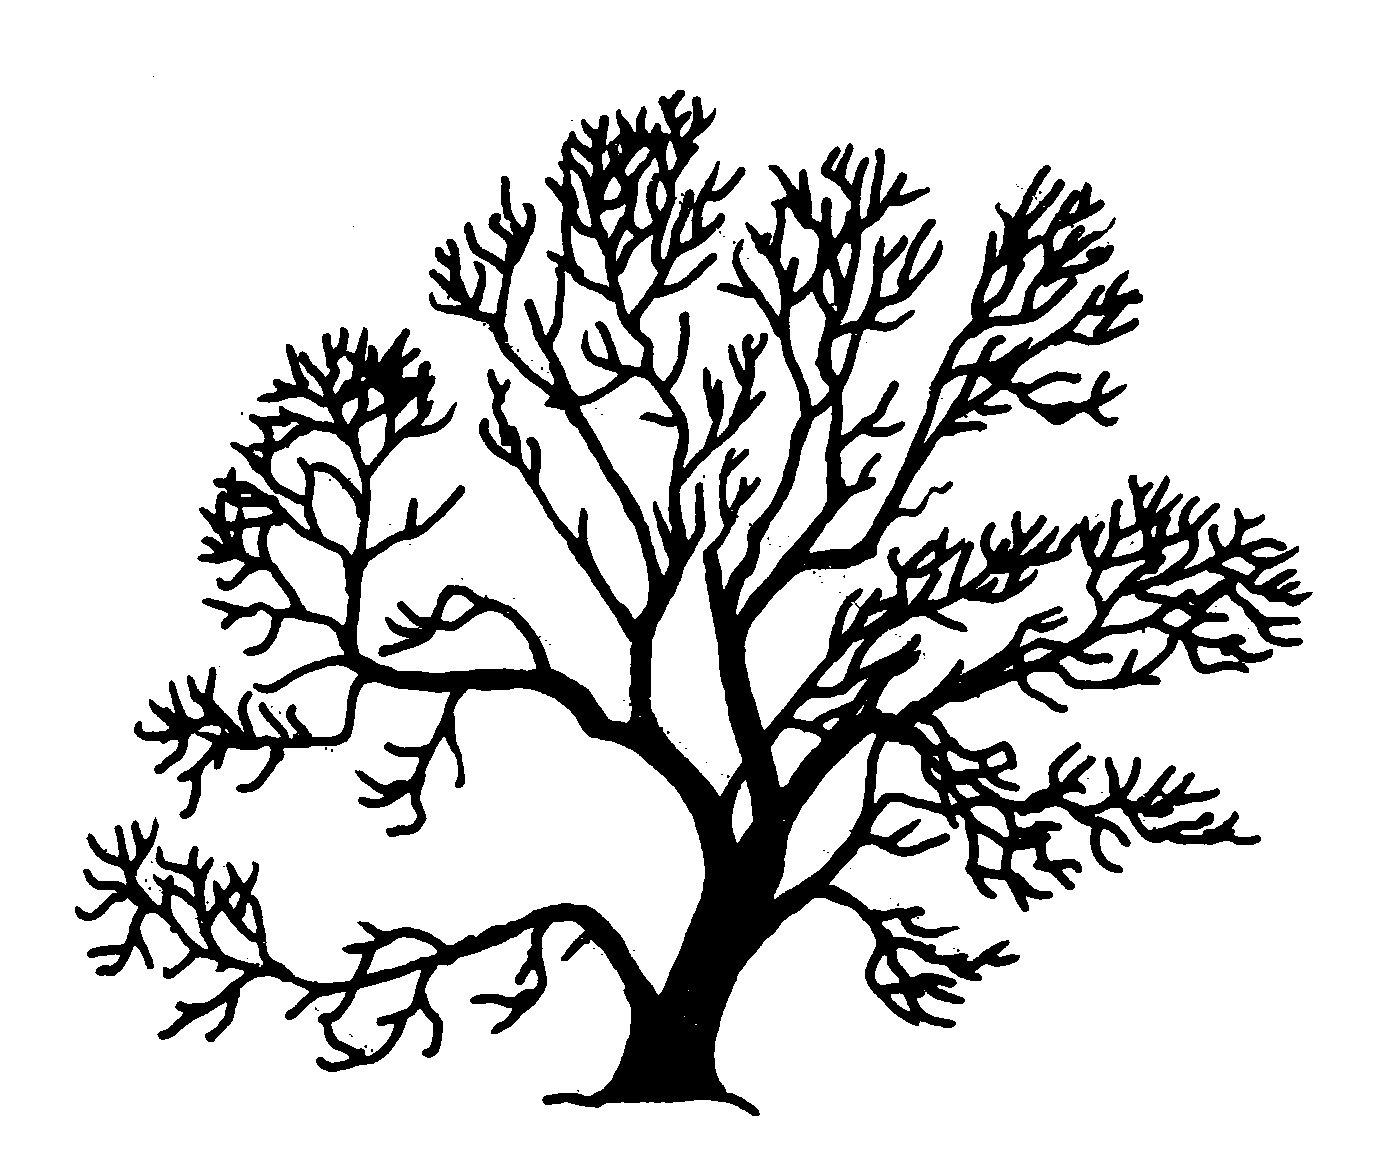 Plik Salix Fragilis Silhouette Oddsock Wikipedia